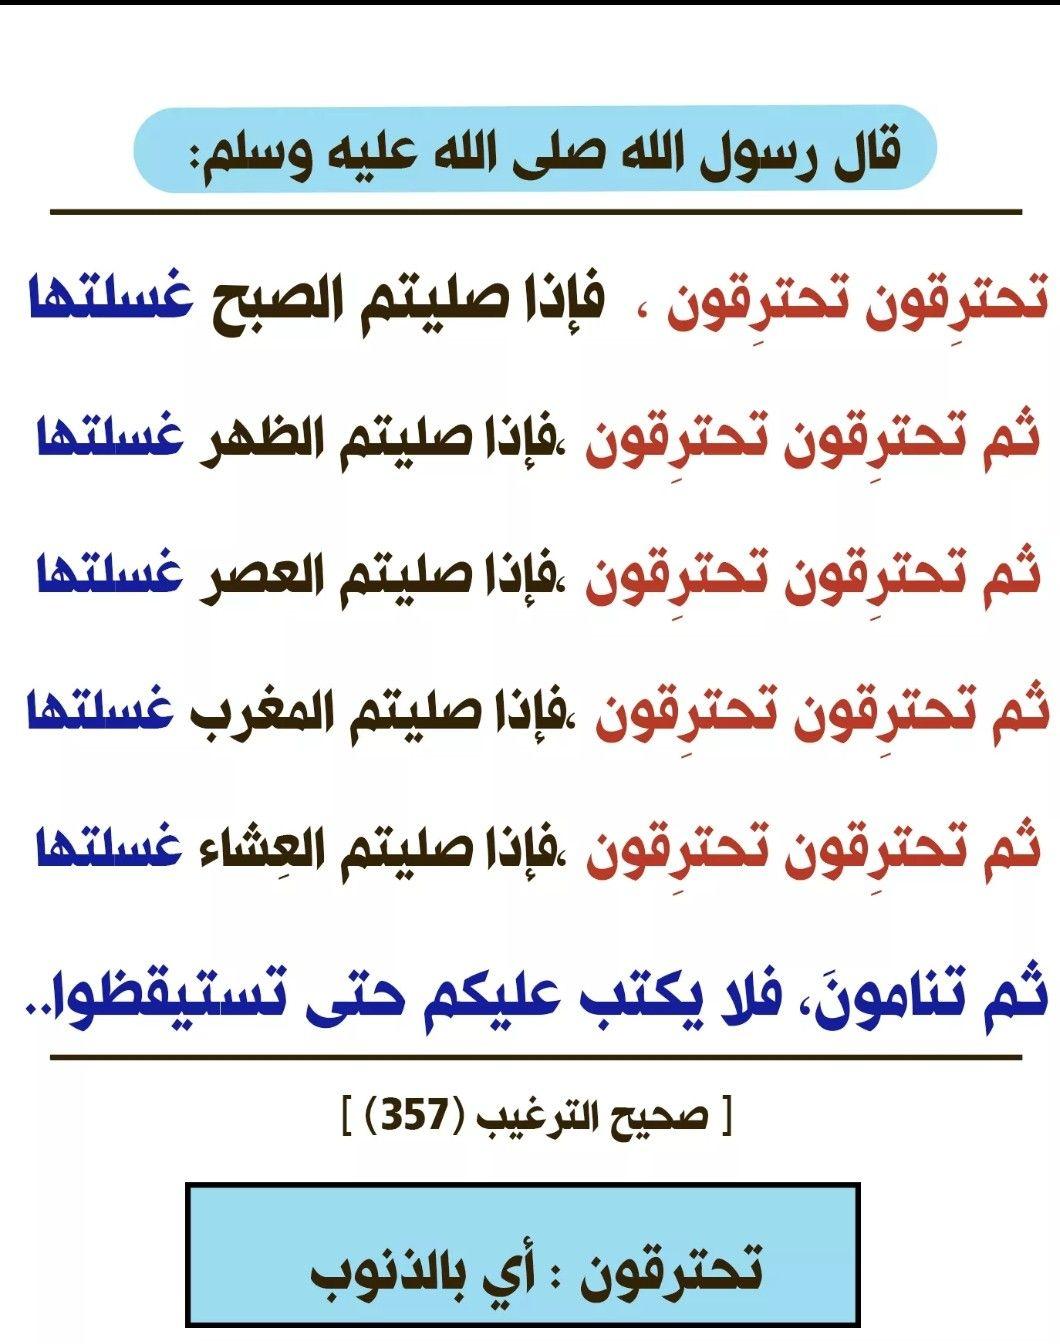 Pin By The Noble Quran On I Love Allah Quran Islam The Prophet Miracles Hadith Heaven Prophets Faith Prayer Dua حكم وعبر احاديث الله اسلام قرآن دعاء Ahadith Holy Quran My Prayer